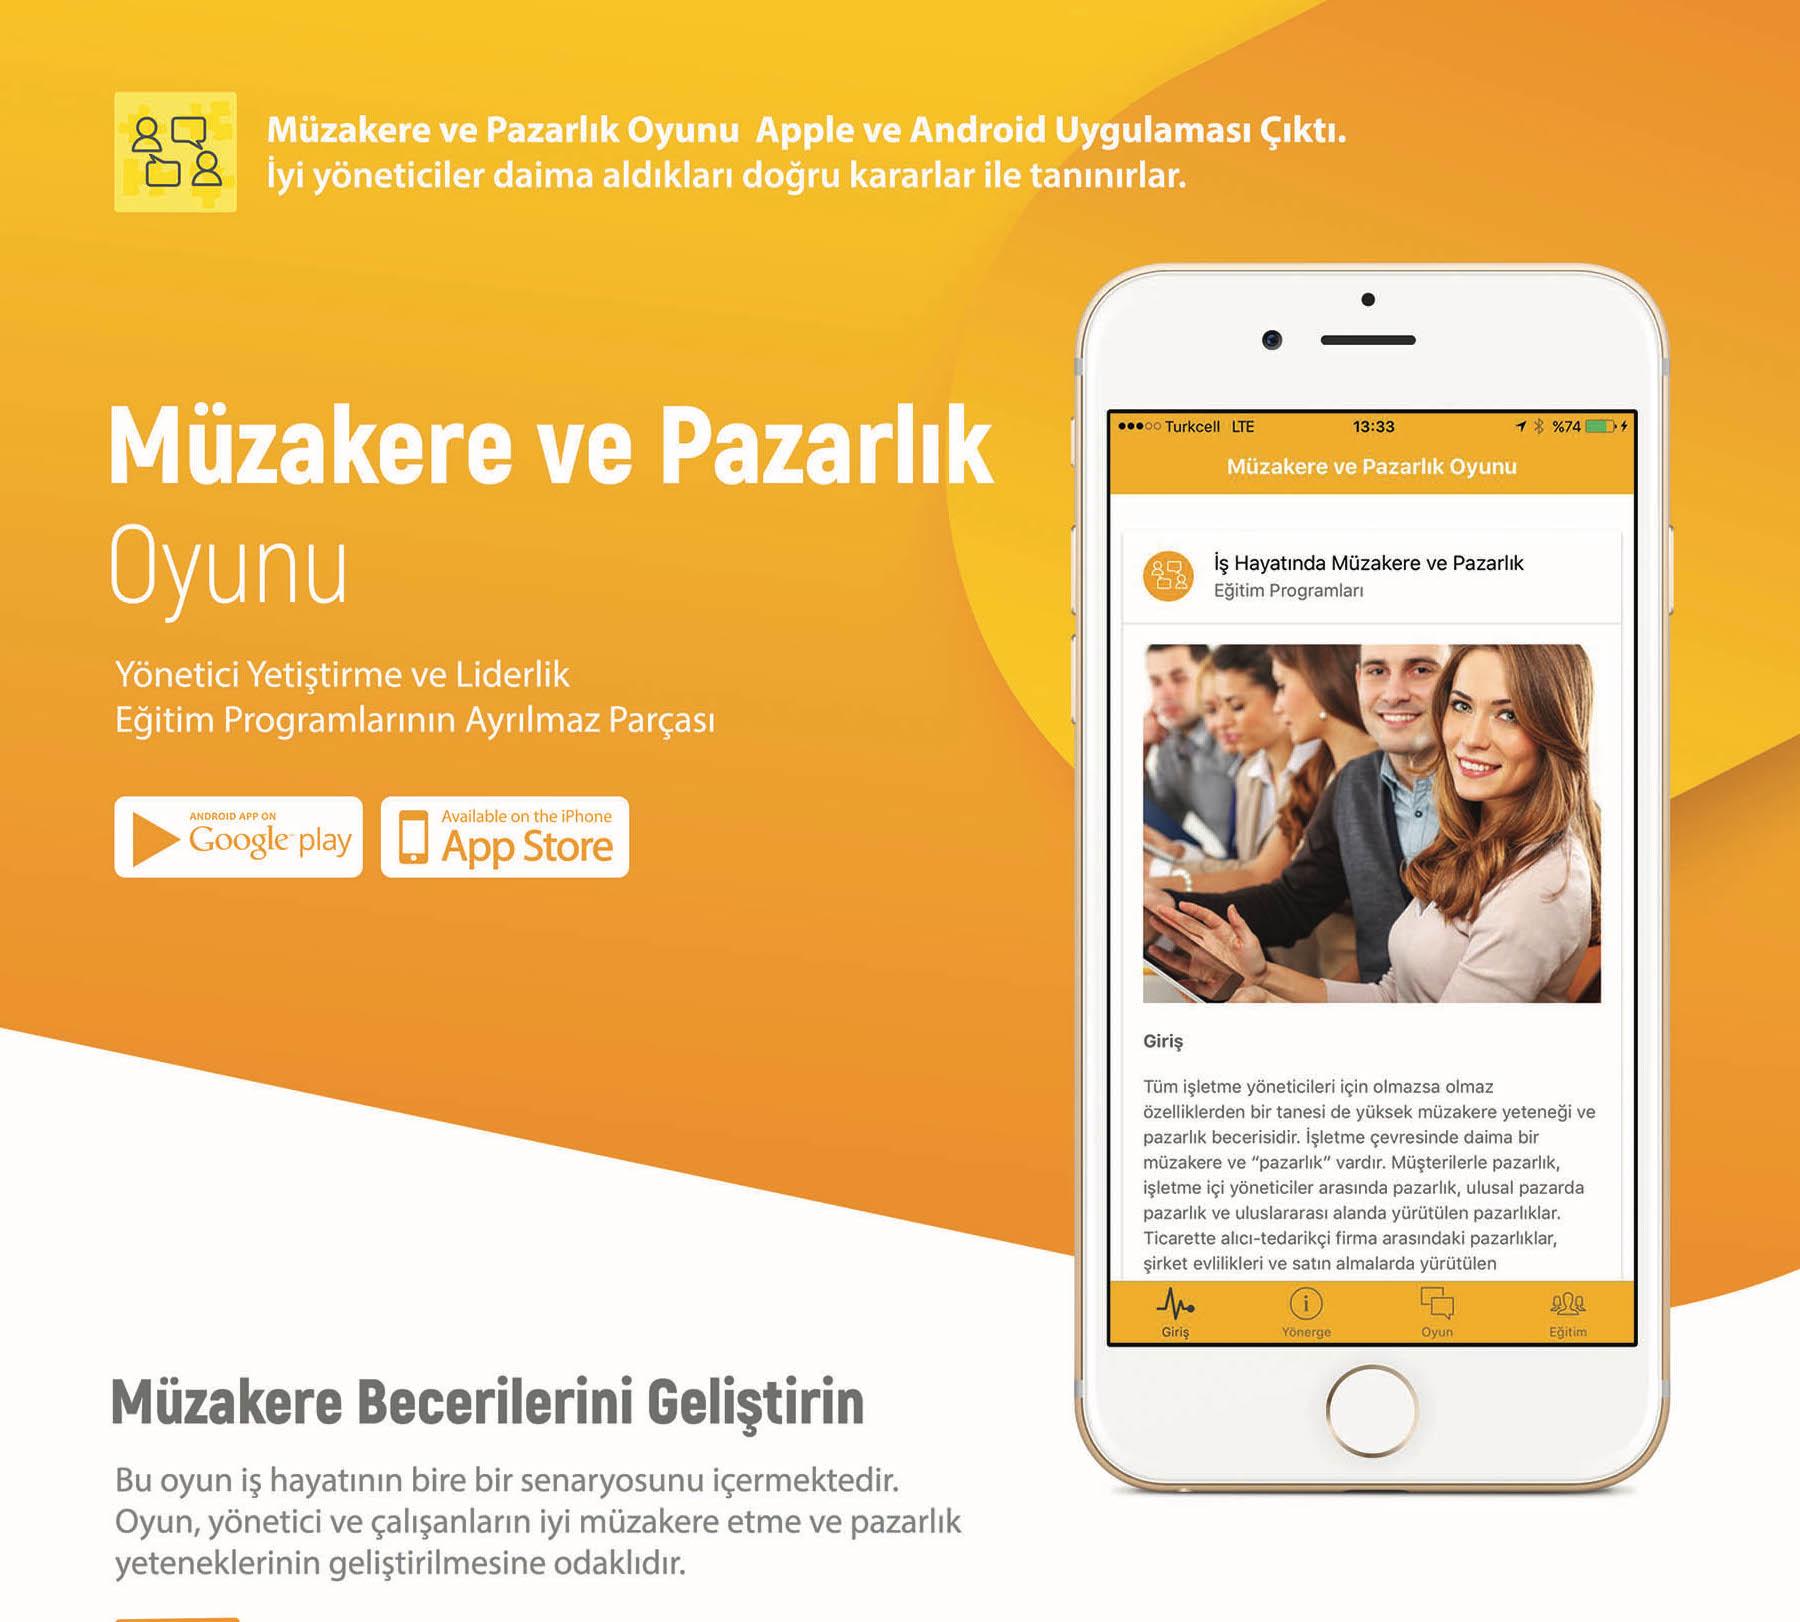 http://www.tedarikzinciri.org/wp-content/uploads/2015/12/muzakere-oyunu-1.jpg